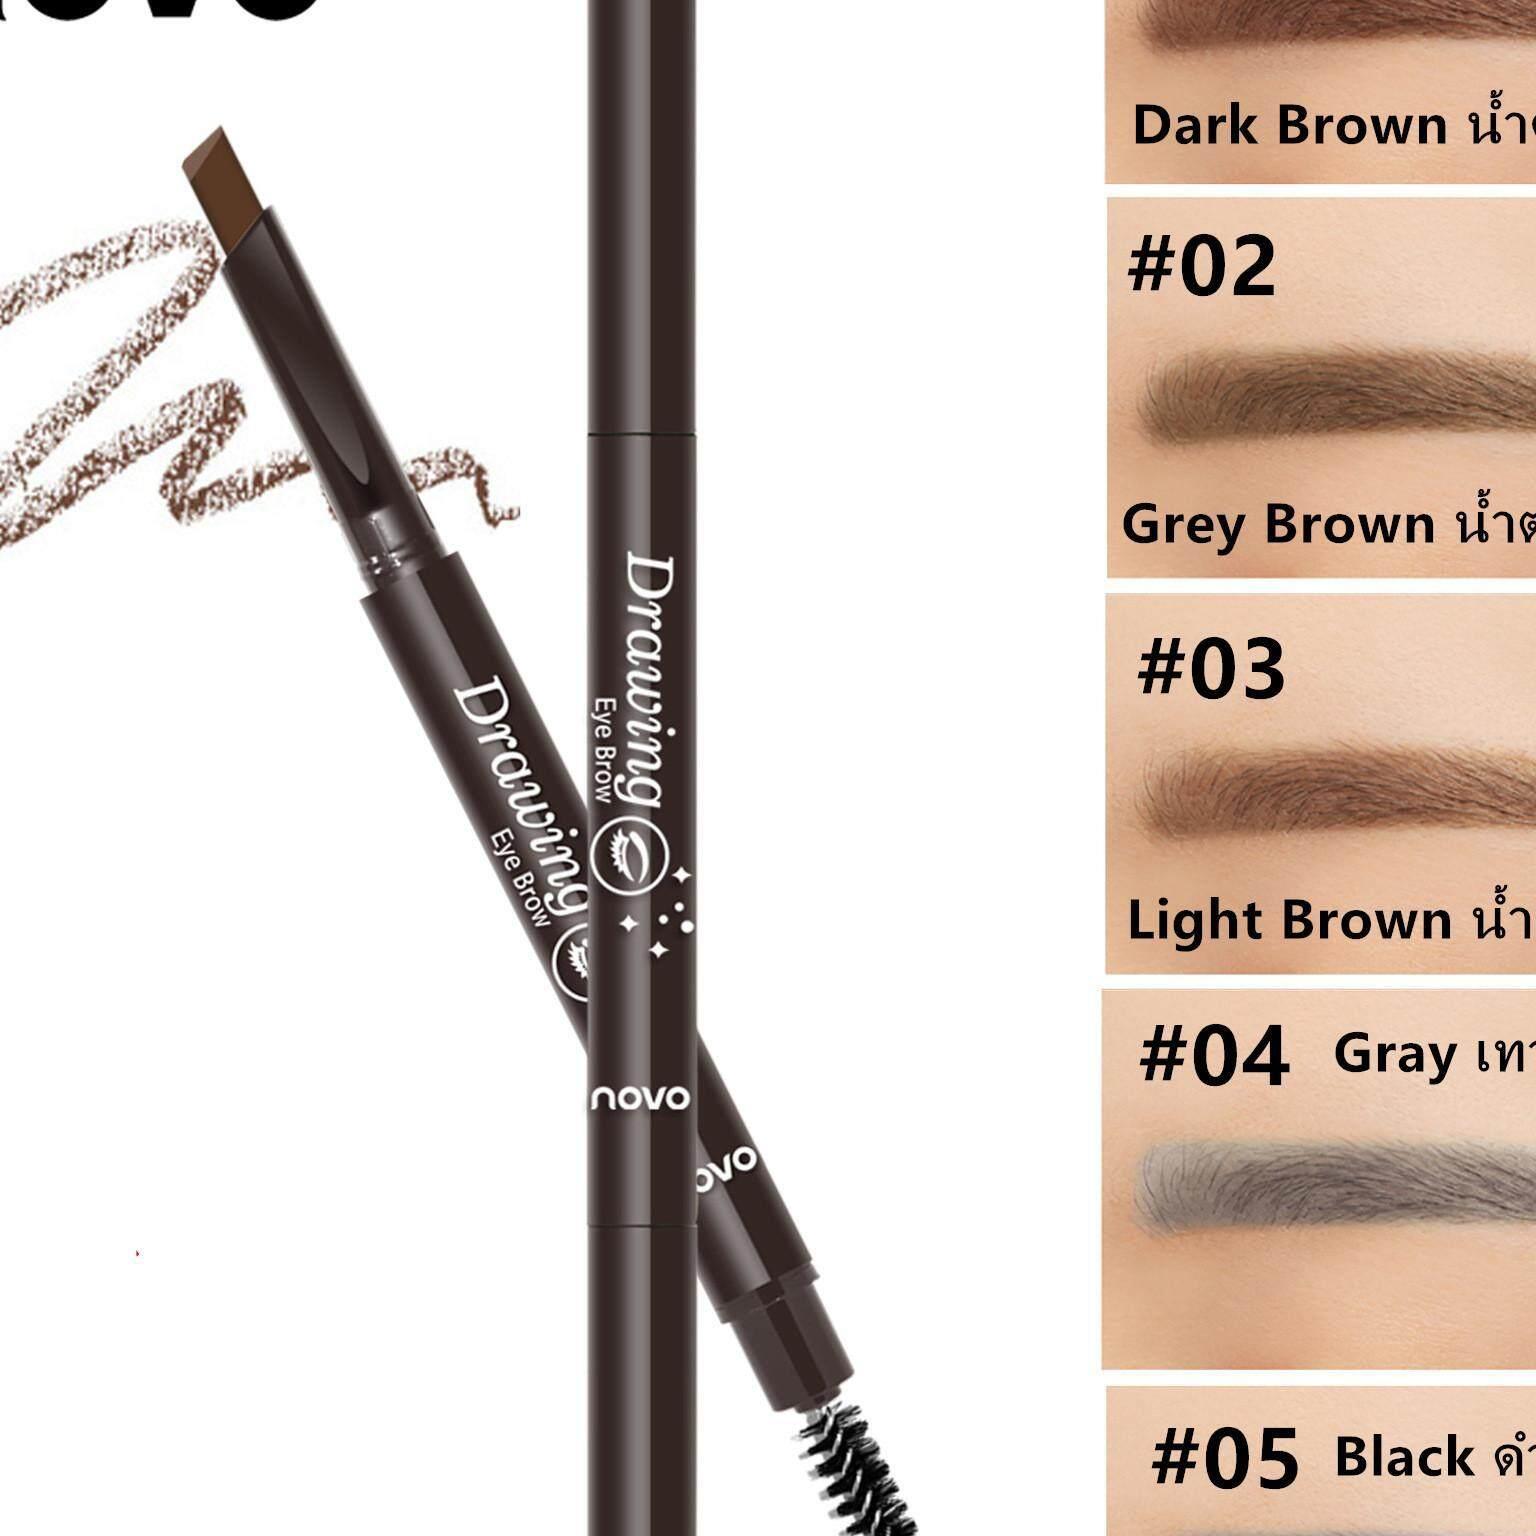 Novo Drawing Eye Brow เพิ่มปริมาณ↑30% โนโว ดินสอเขียนคิ้ว กันน้ำ ของแท้ 100% ดินสอ เนื้อเนียนนุ่ม เขียนง่าย ติดทน มาในรูปออโต้เพนซิล ไม่ต้องเหลาให้เสียเวลา By Belive Shop.